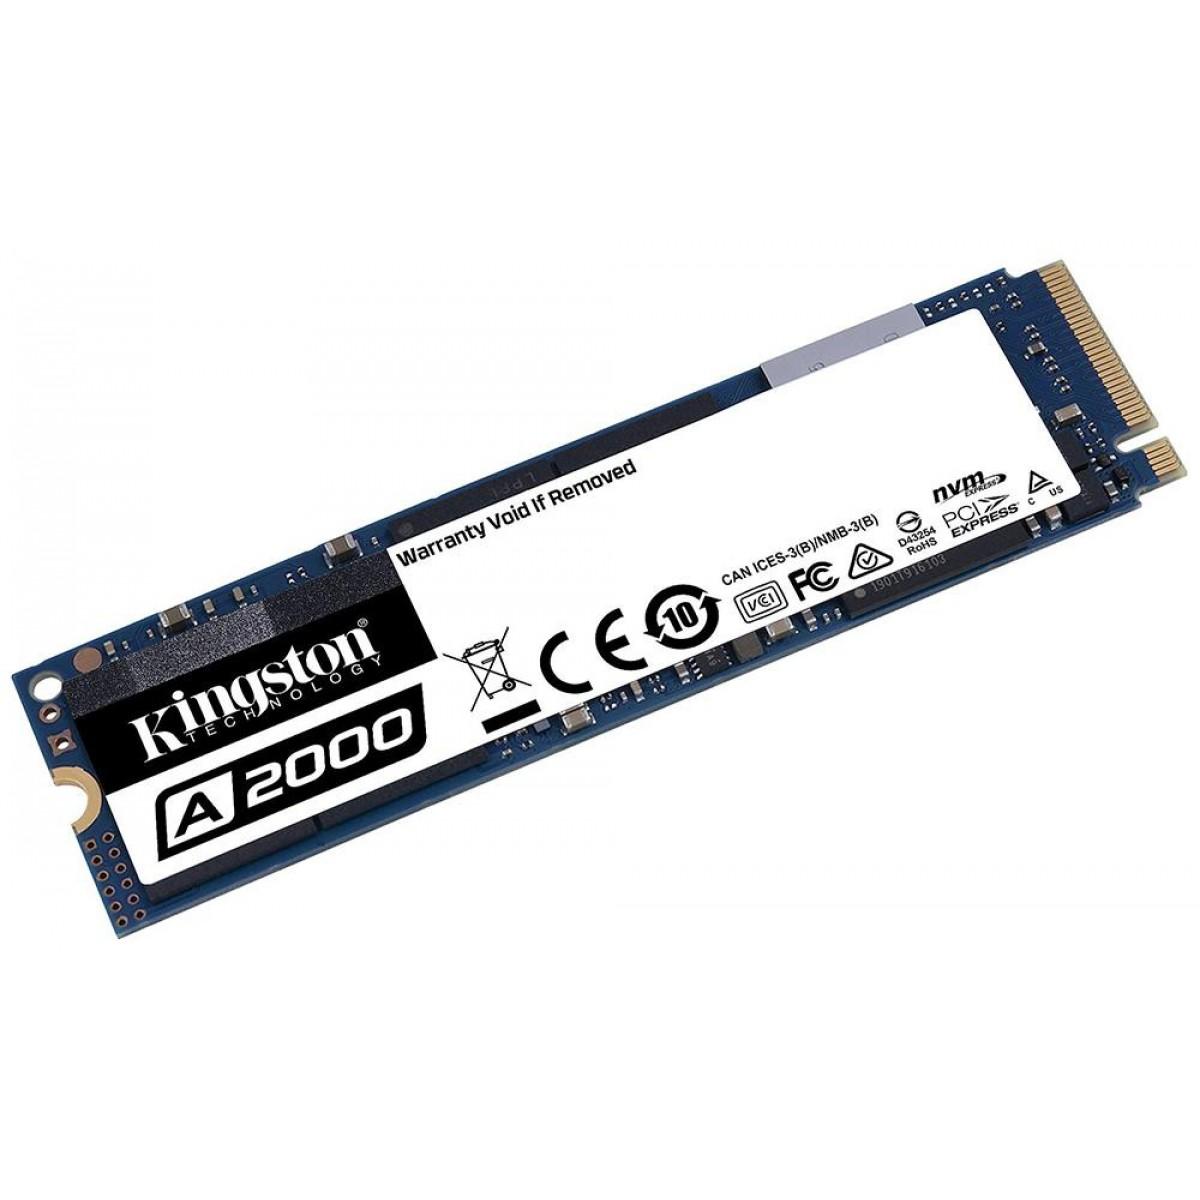 SSD Kingston A2000, 1TB, M.2 2280, NVMe, Leitura 2200MBs e Gravação 2000MBs, SA2000M8/1000G